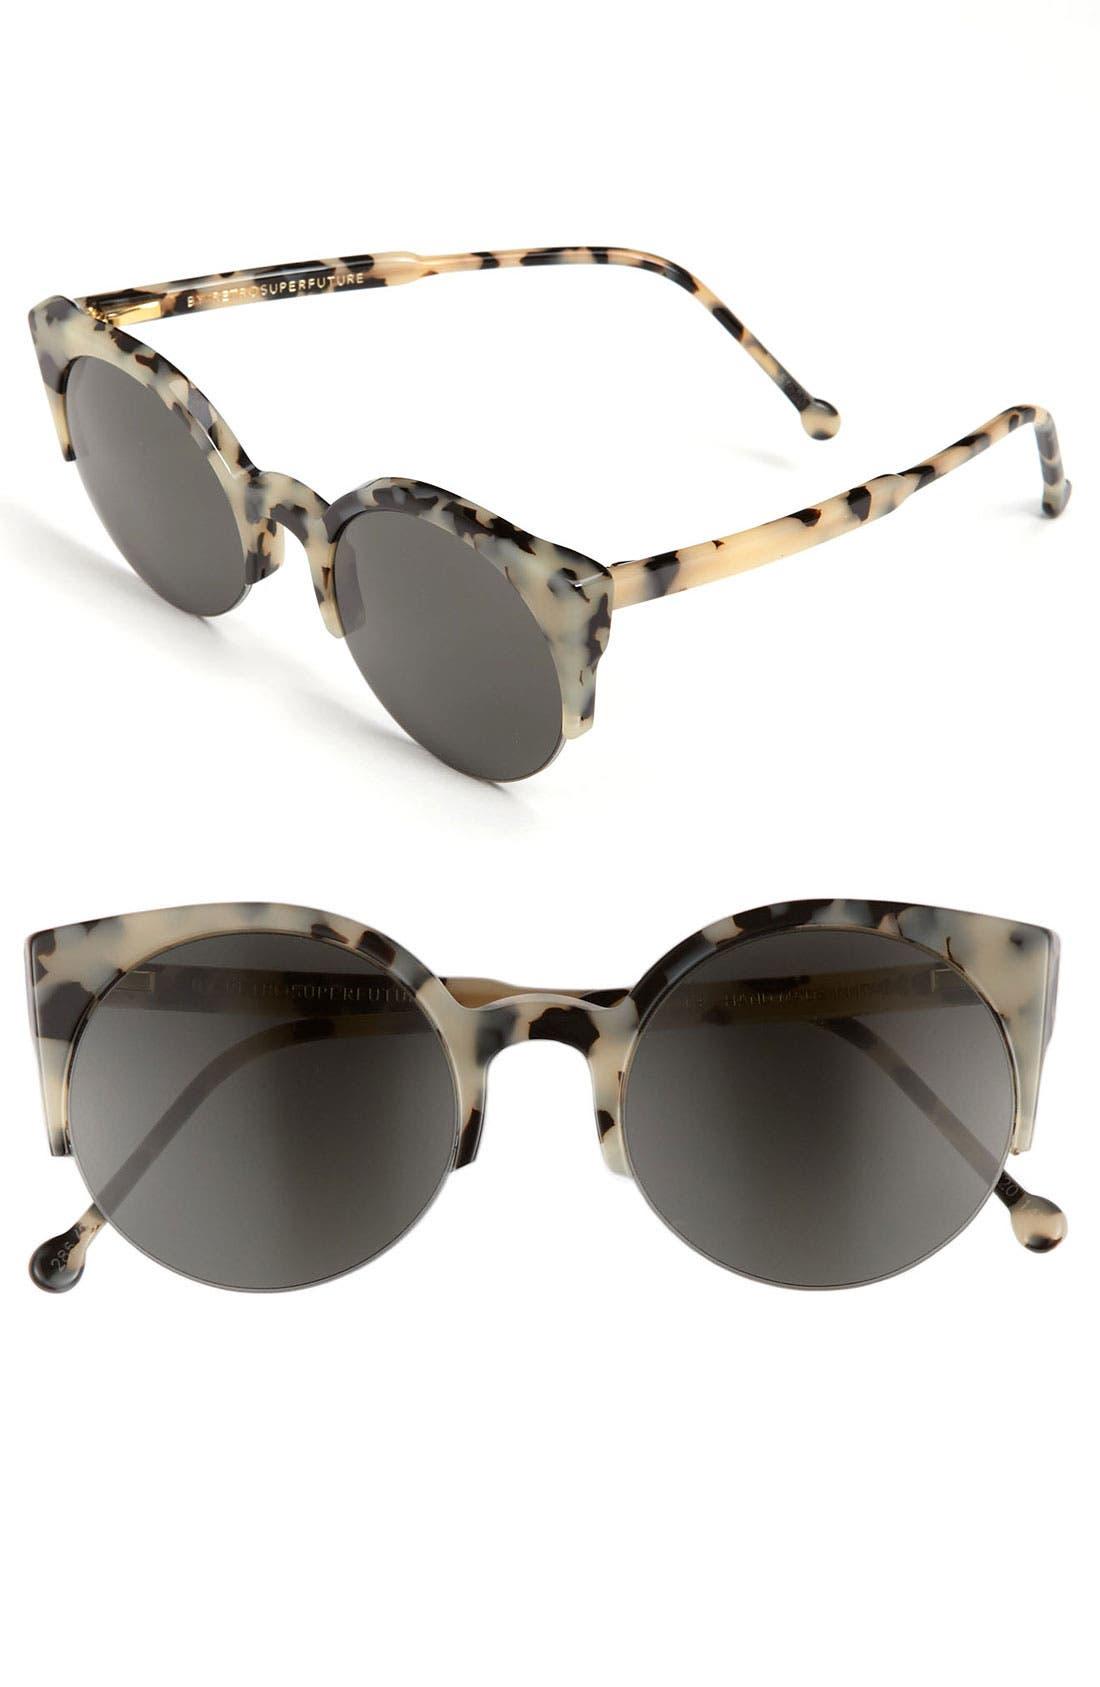 Alternate Image 1 Selected - SUPER by RETROSUPERFUTURE® 'Lucia' 51mm Sunglasses